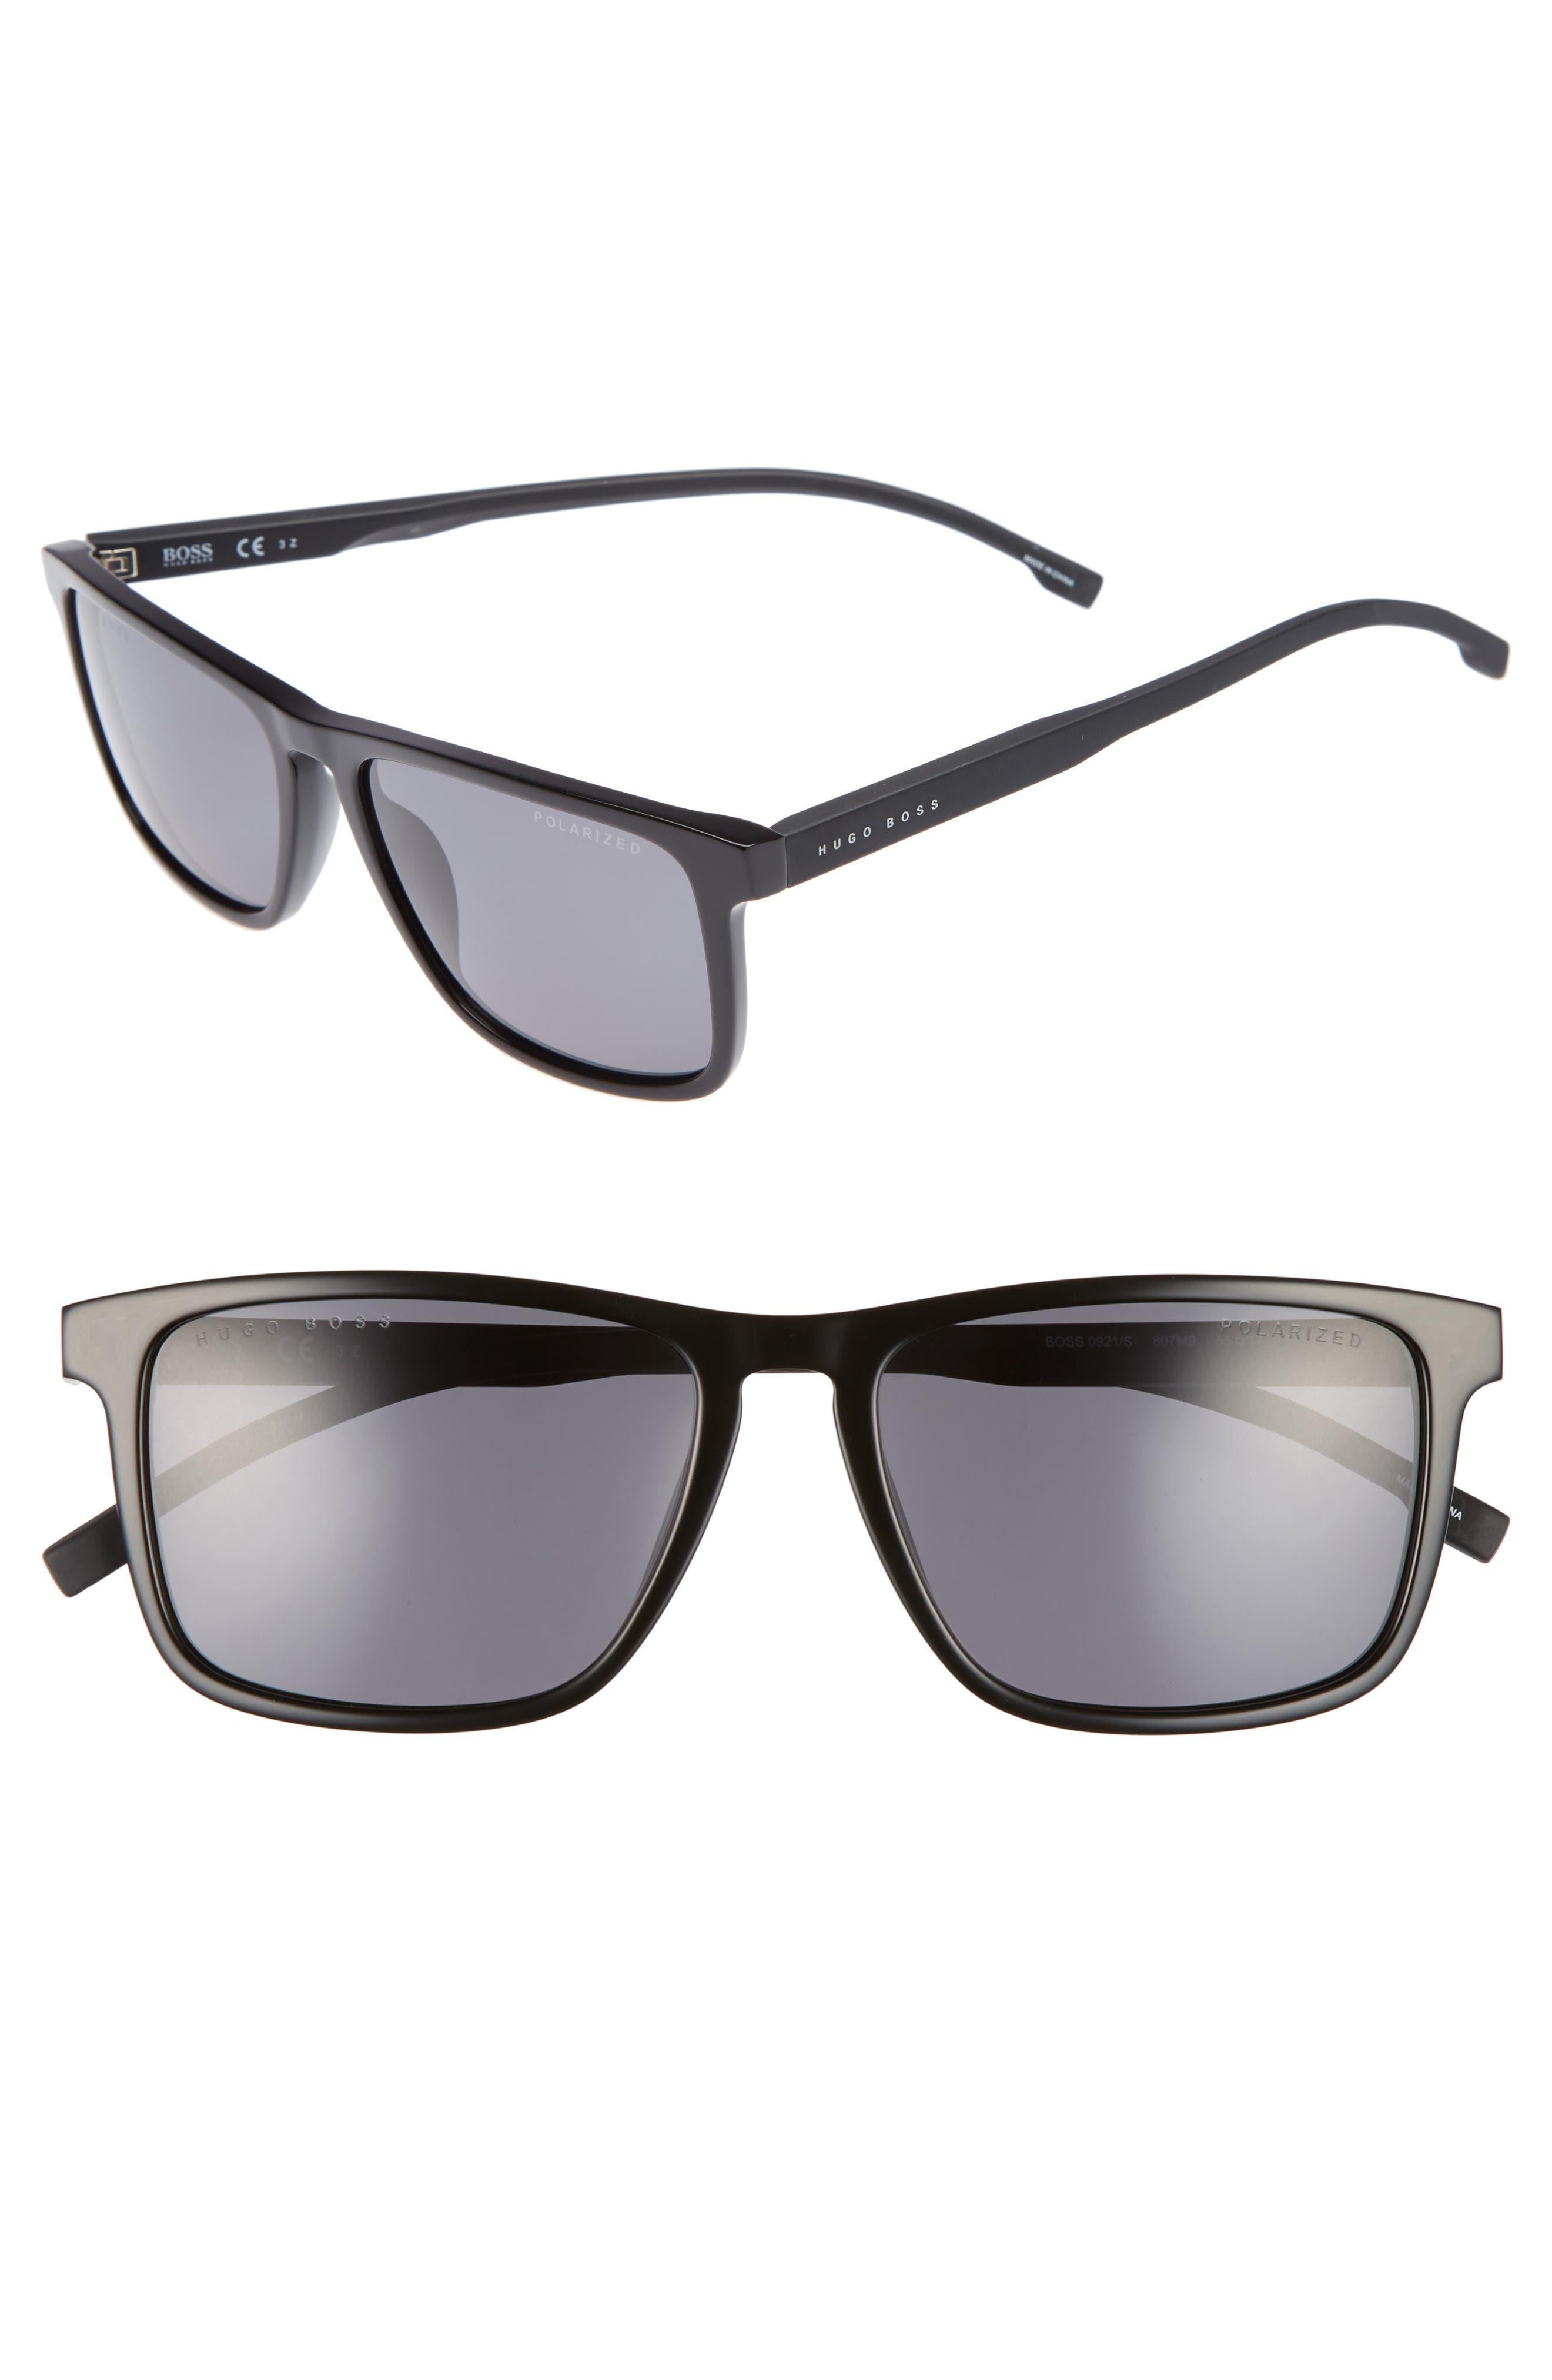 55mm Sunglasses,                             Main thumbnail 1, color,                             Black/ Gray Polarized